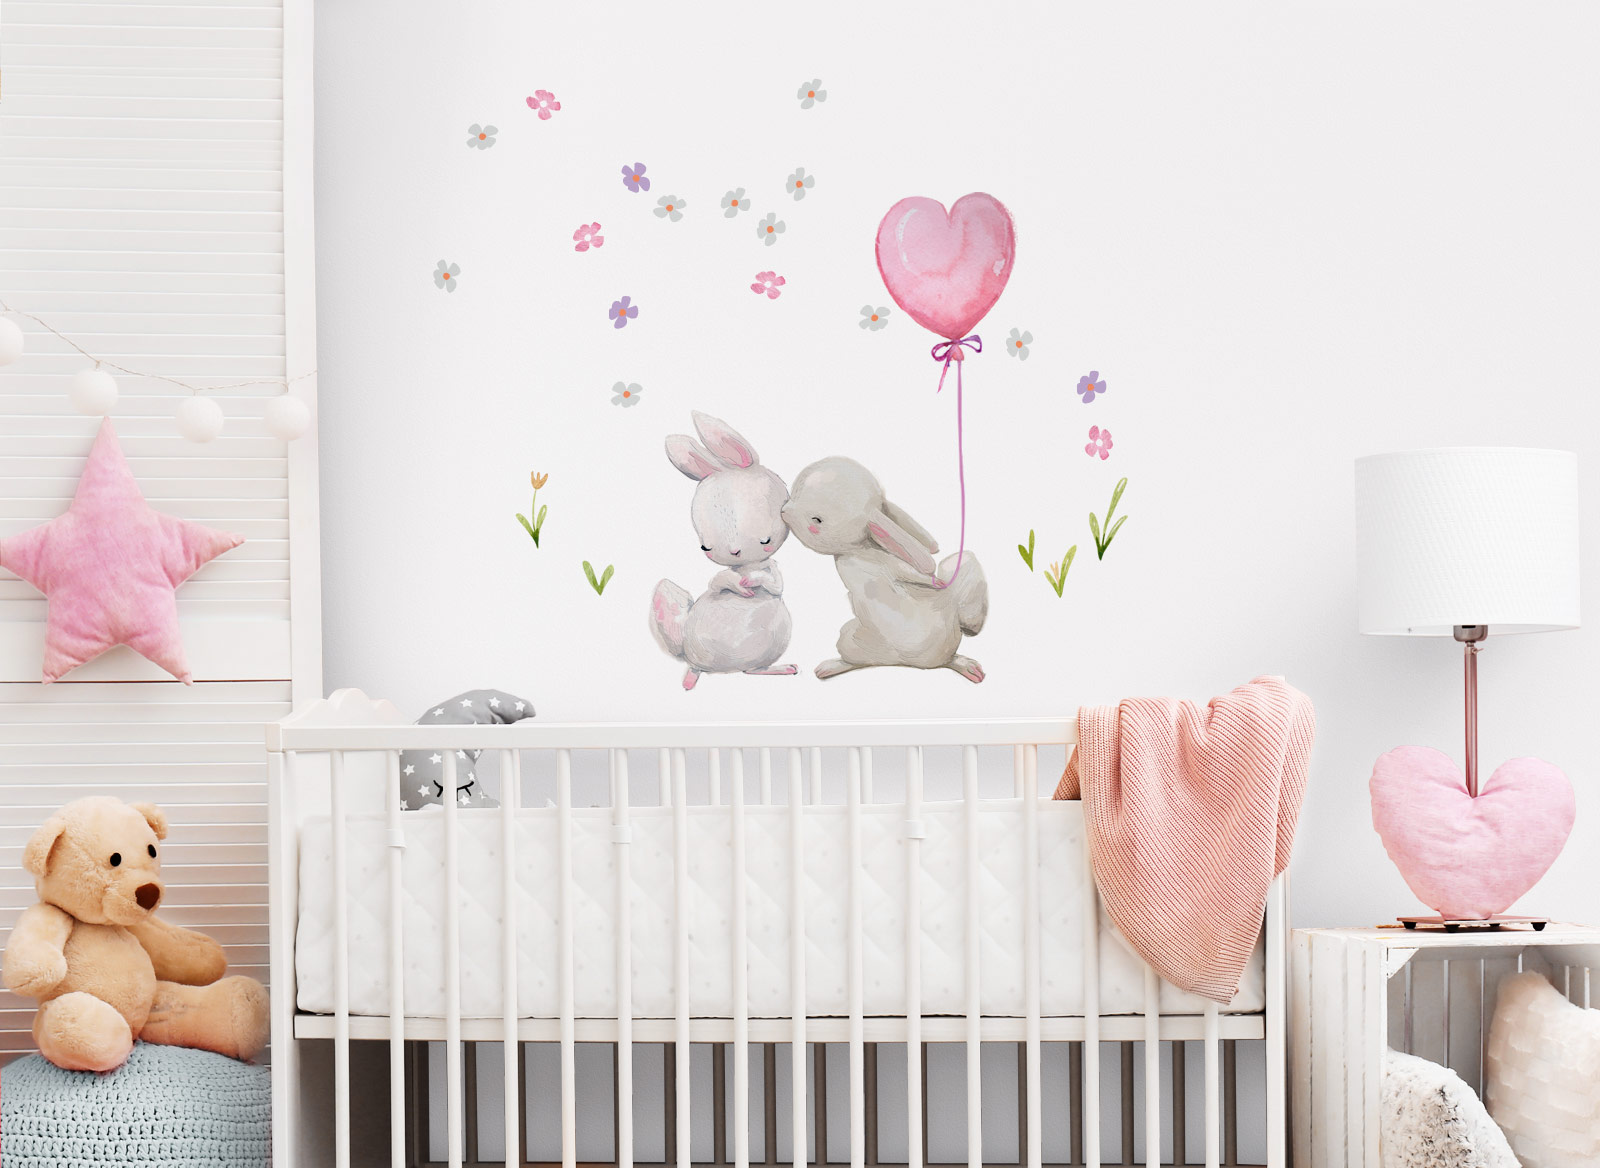 Little Deco Wandtattoo Küssende Hasen mit Luftballon Rosa